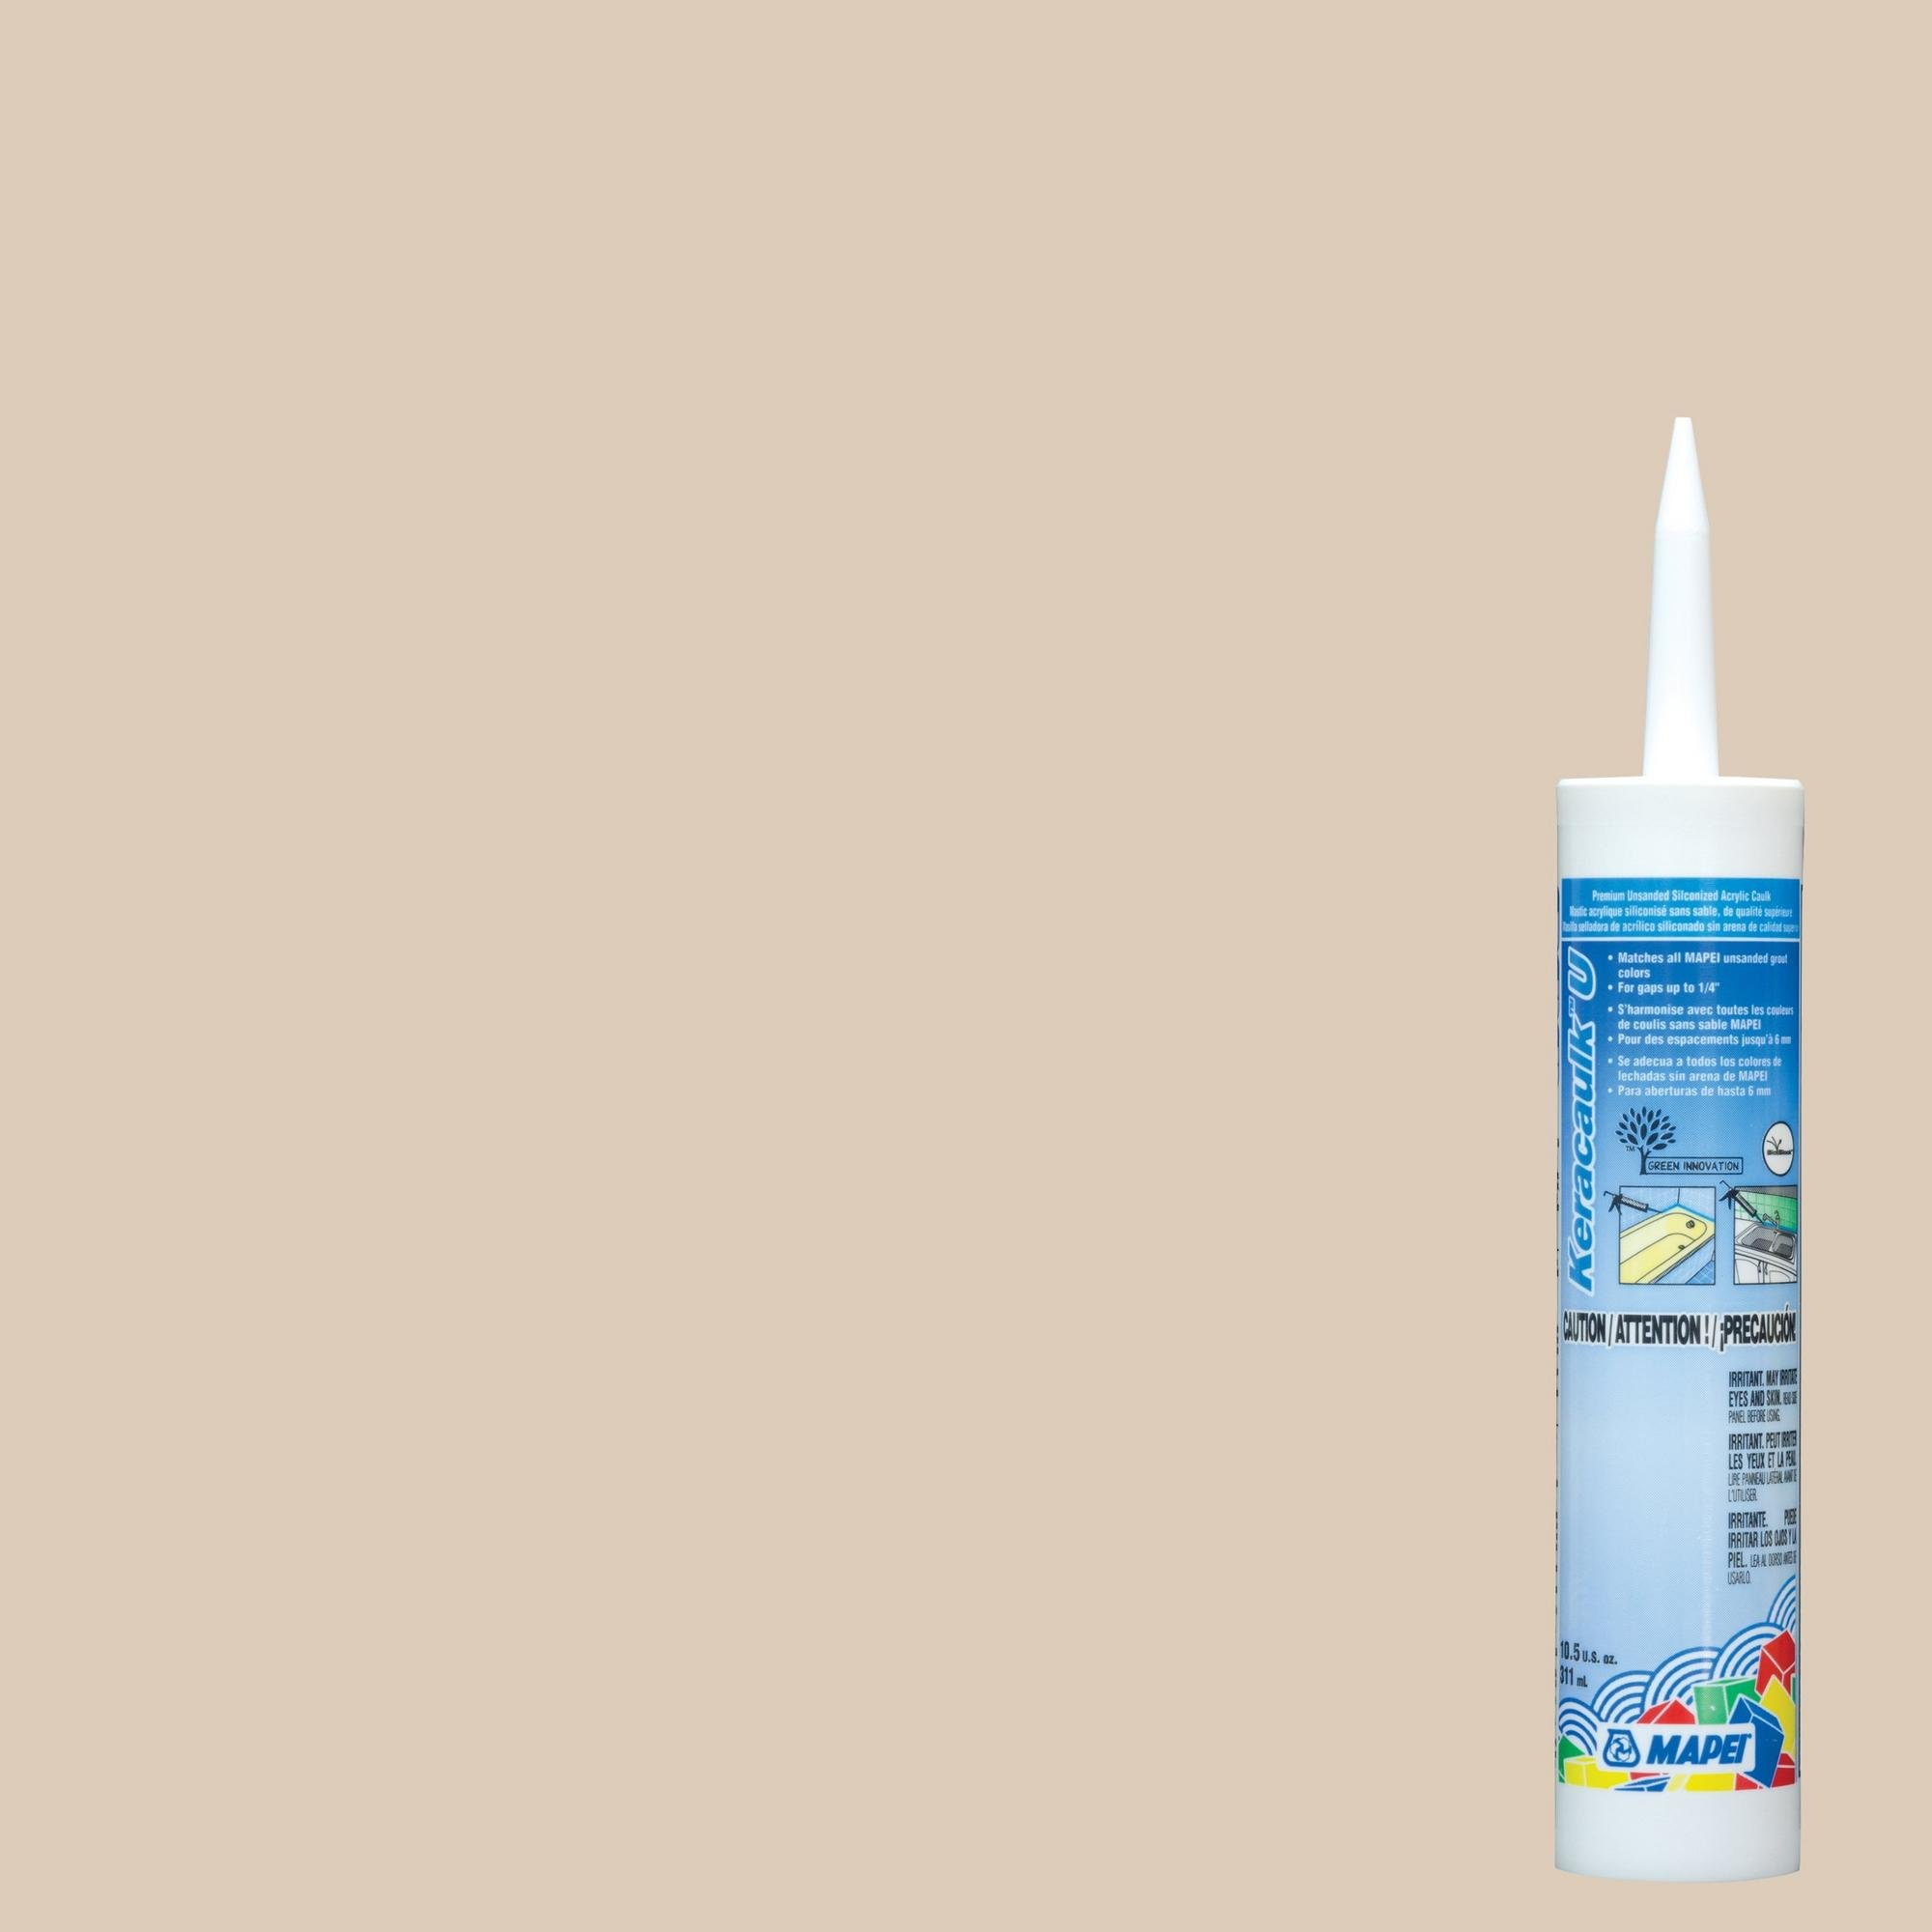 Mapei 49 Light Almond Keracaulk U Unsanded Siliconized Acrylic Caulk by Mapei